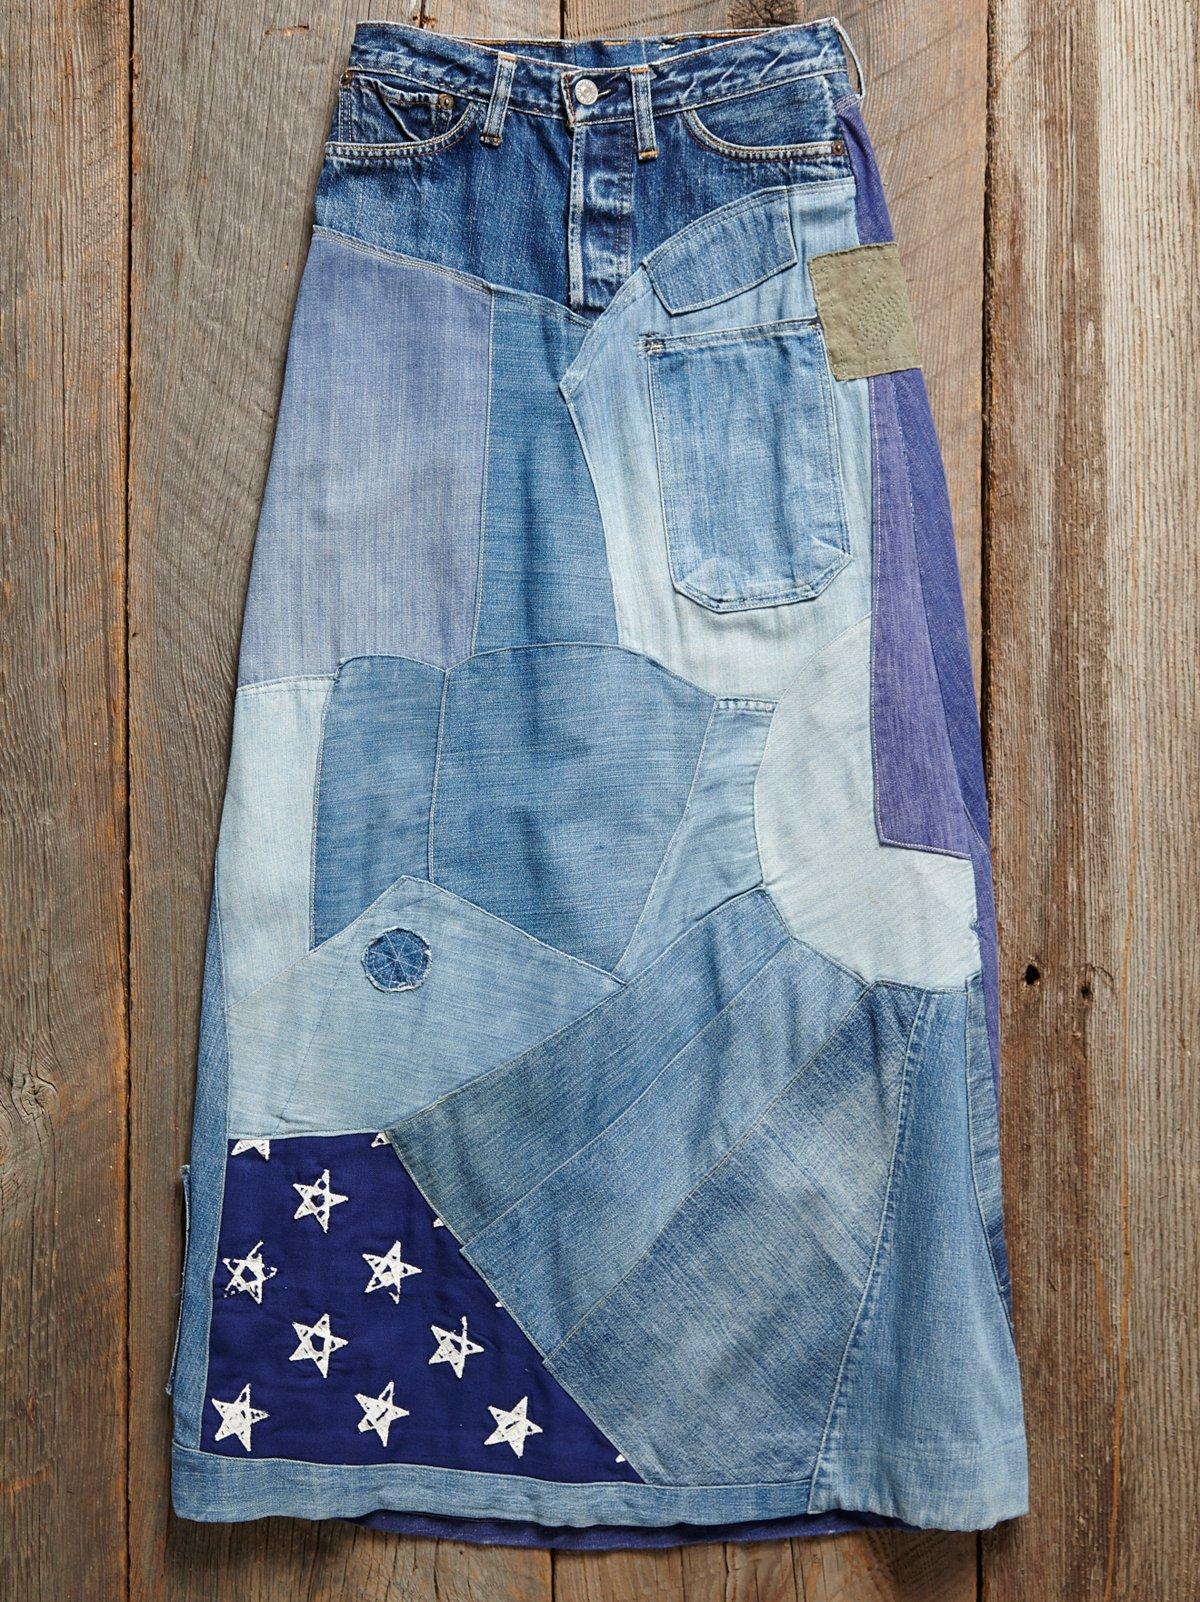 Vintage 1970s Levis Patchwork Skirt